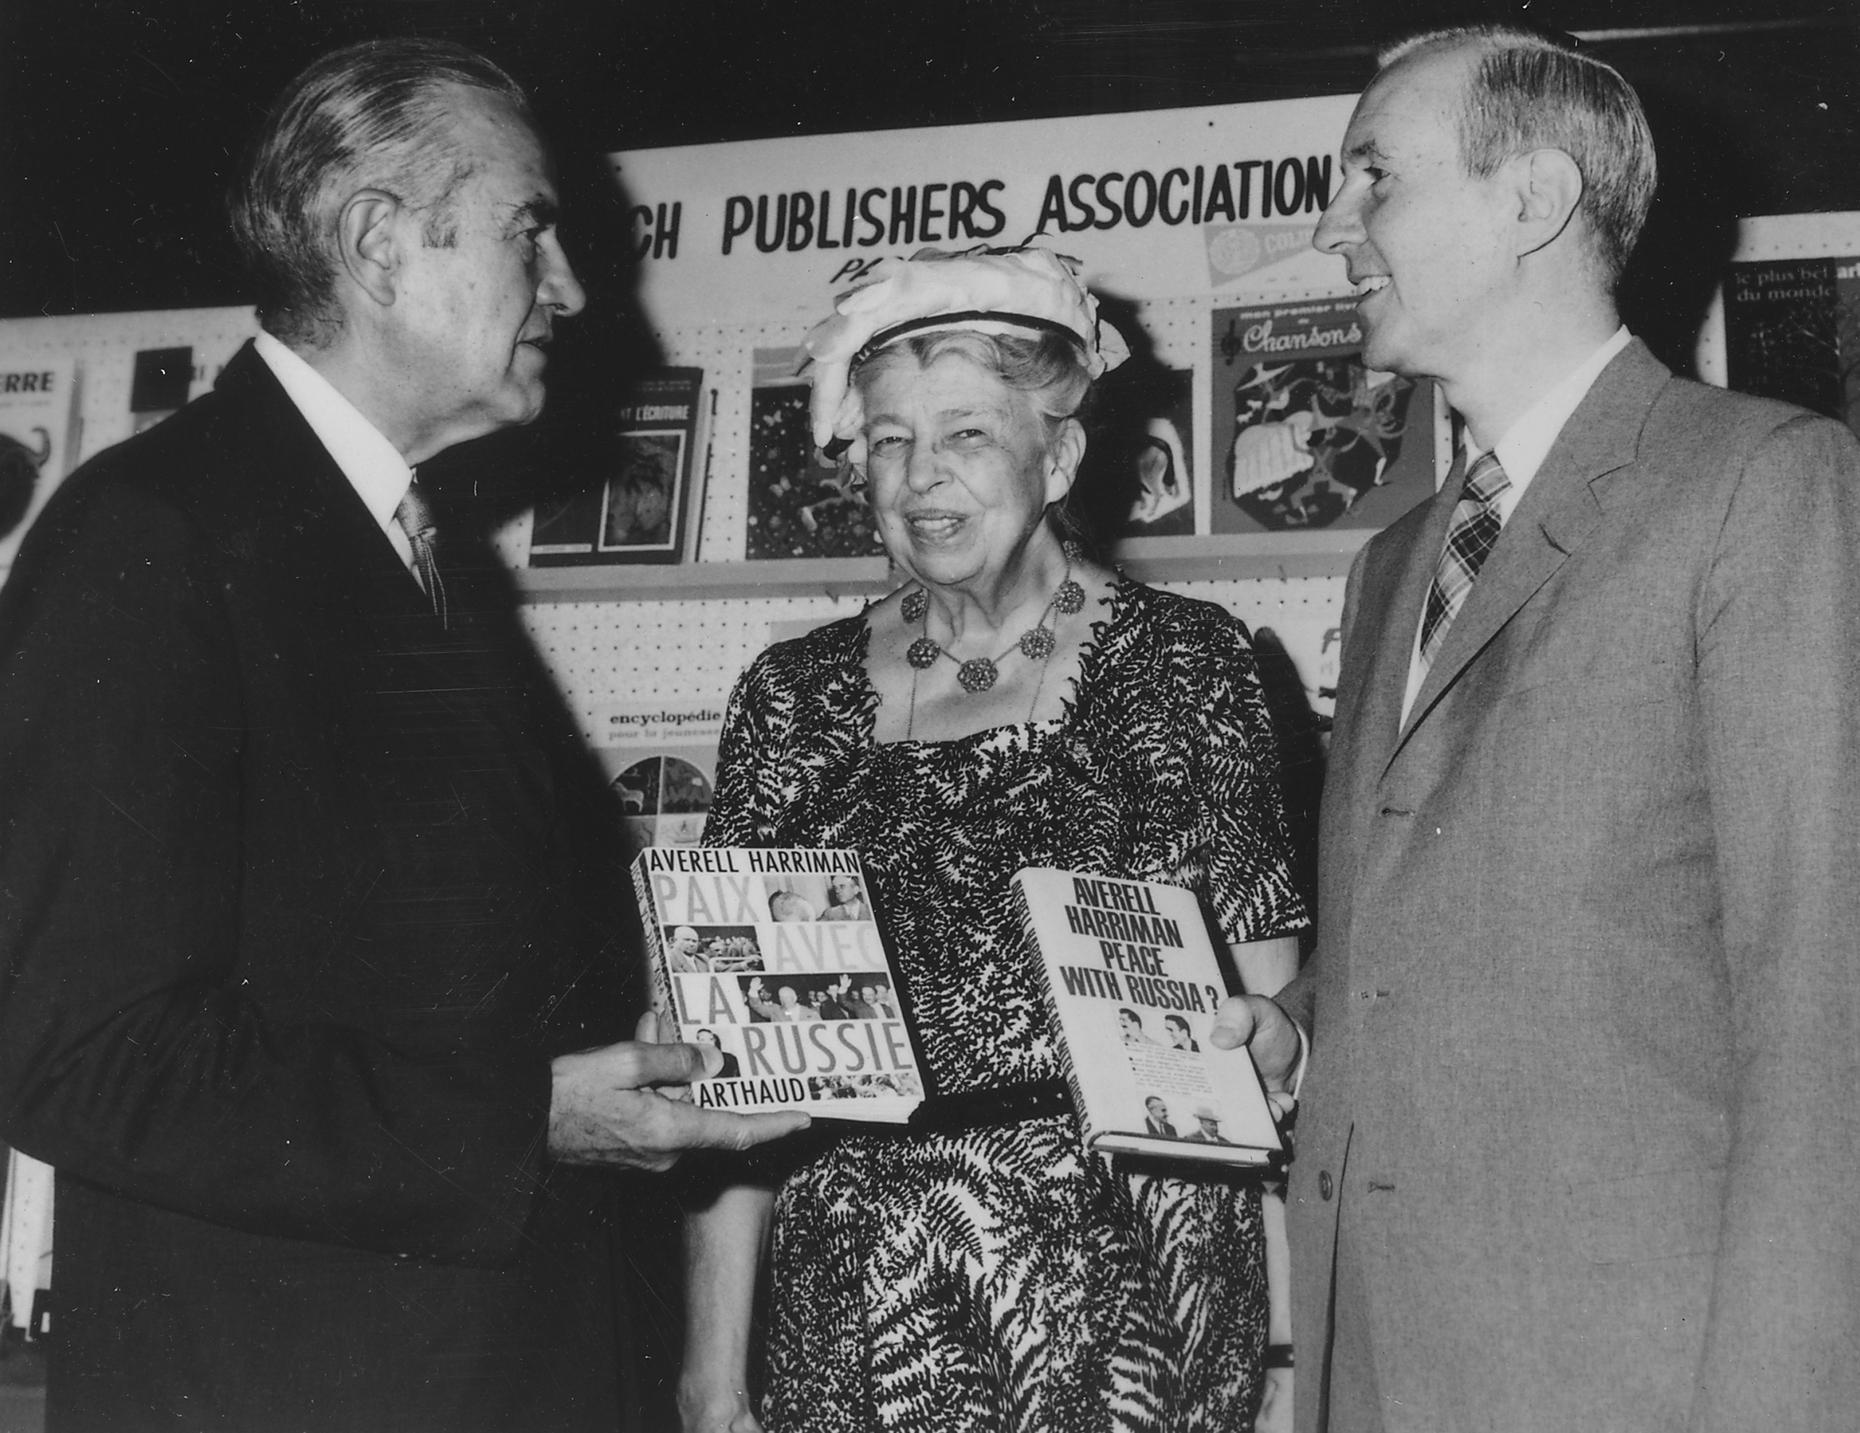 Eleanor-Roosevelt-and-Averell-Harriman-NARA-196126.jpg